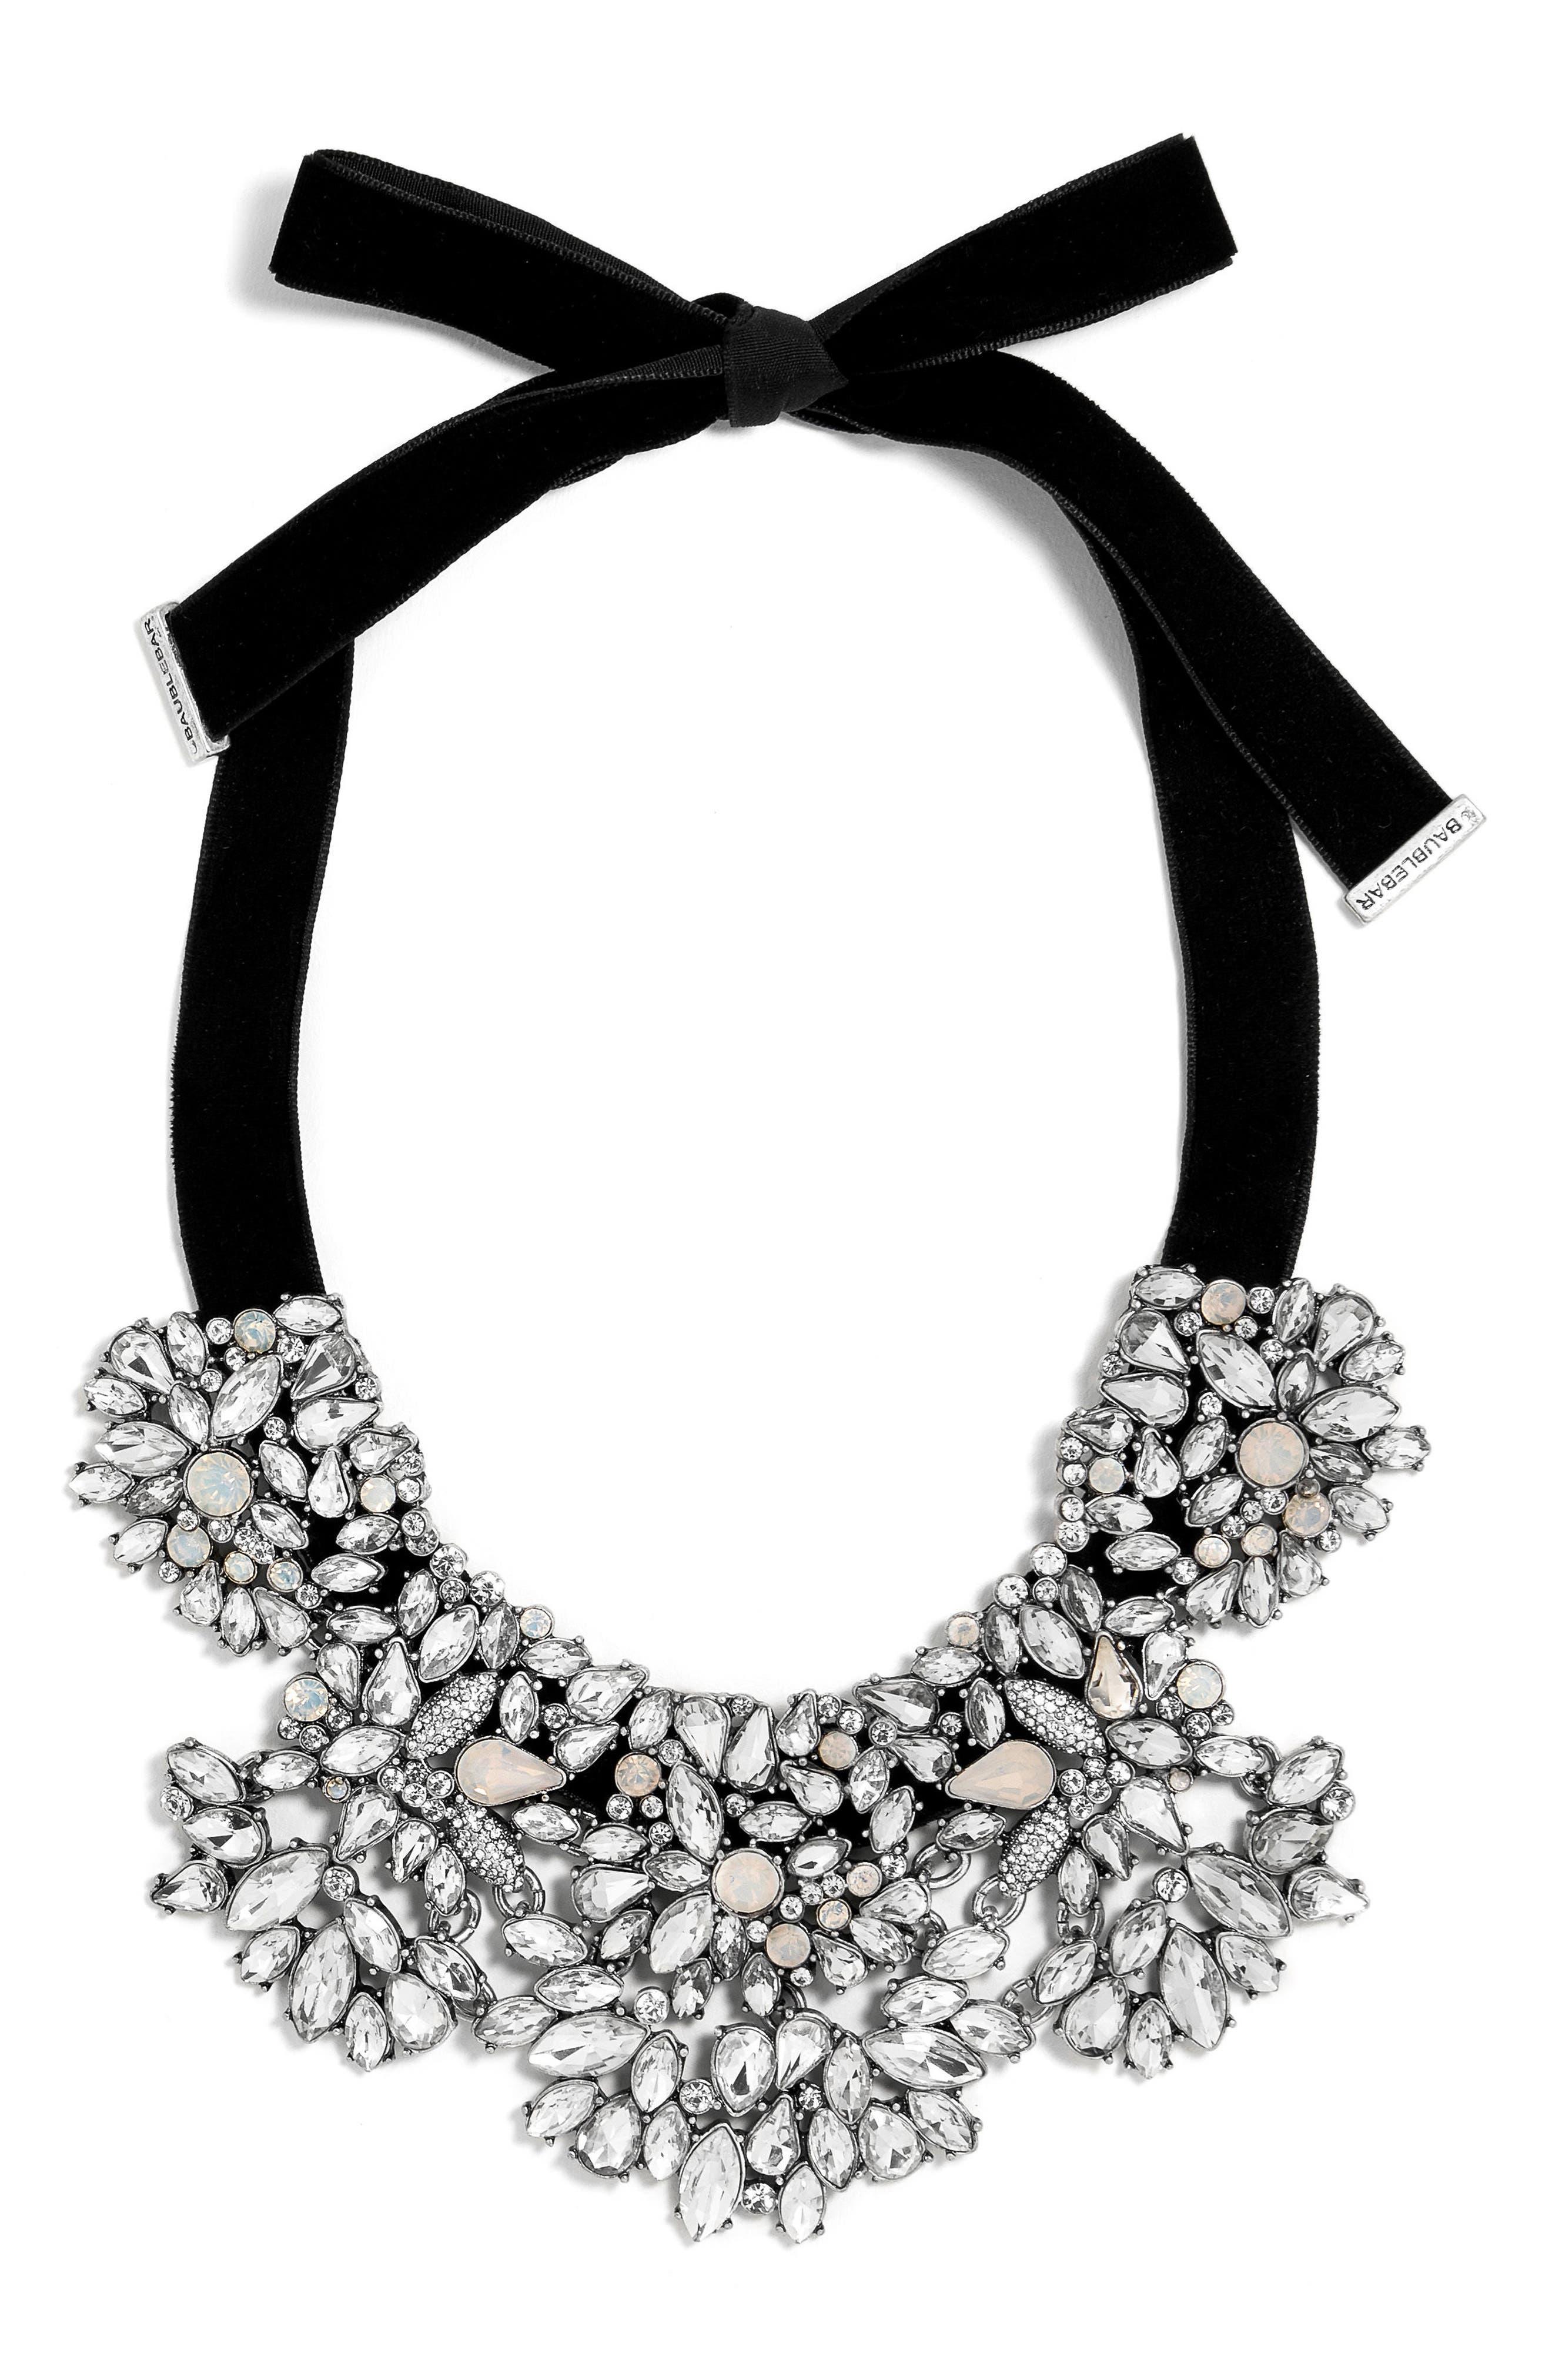 Crystal Shatter Statement Necklace,                         Main,                         color, Black